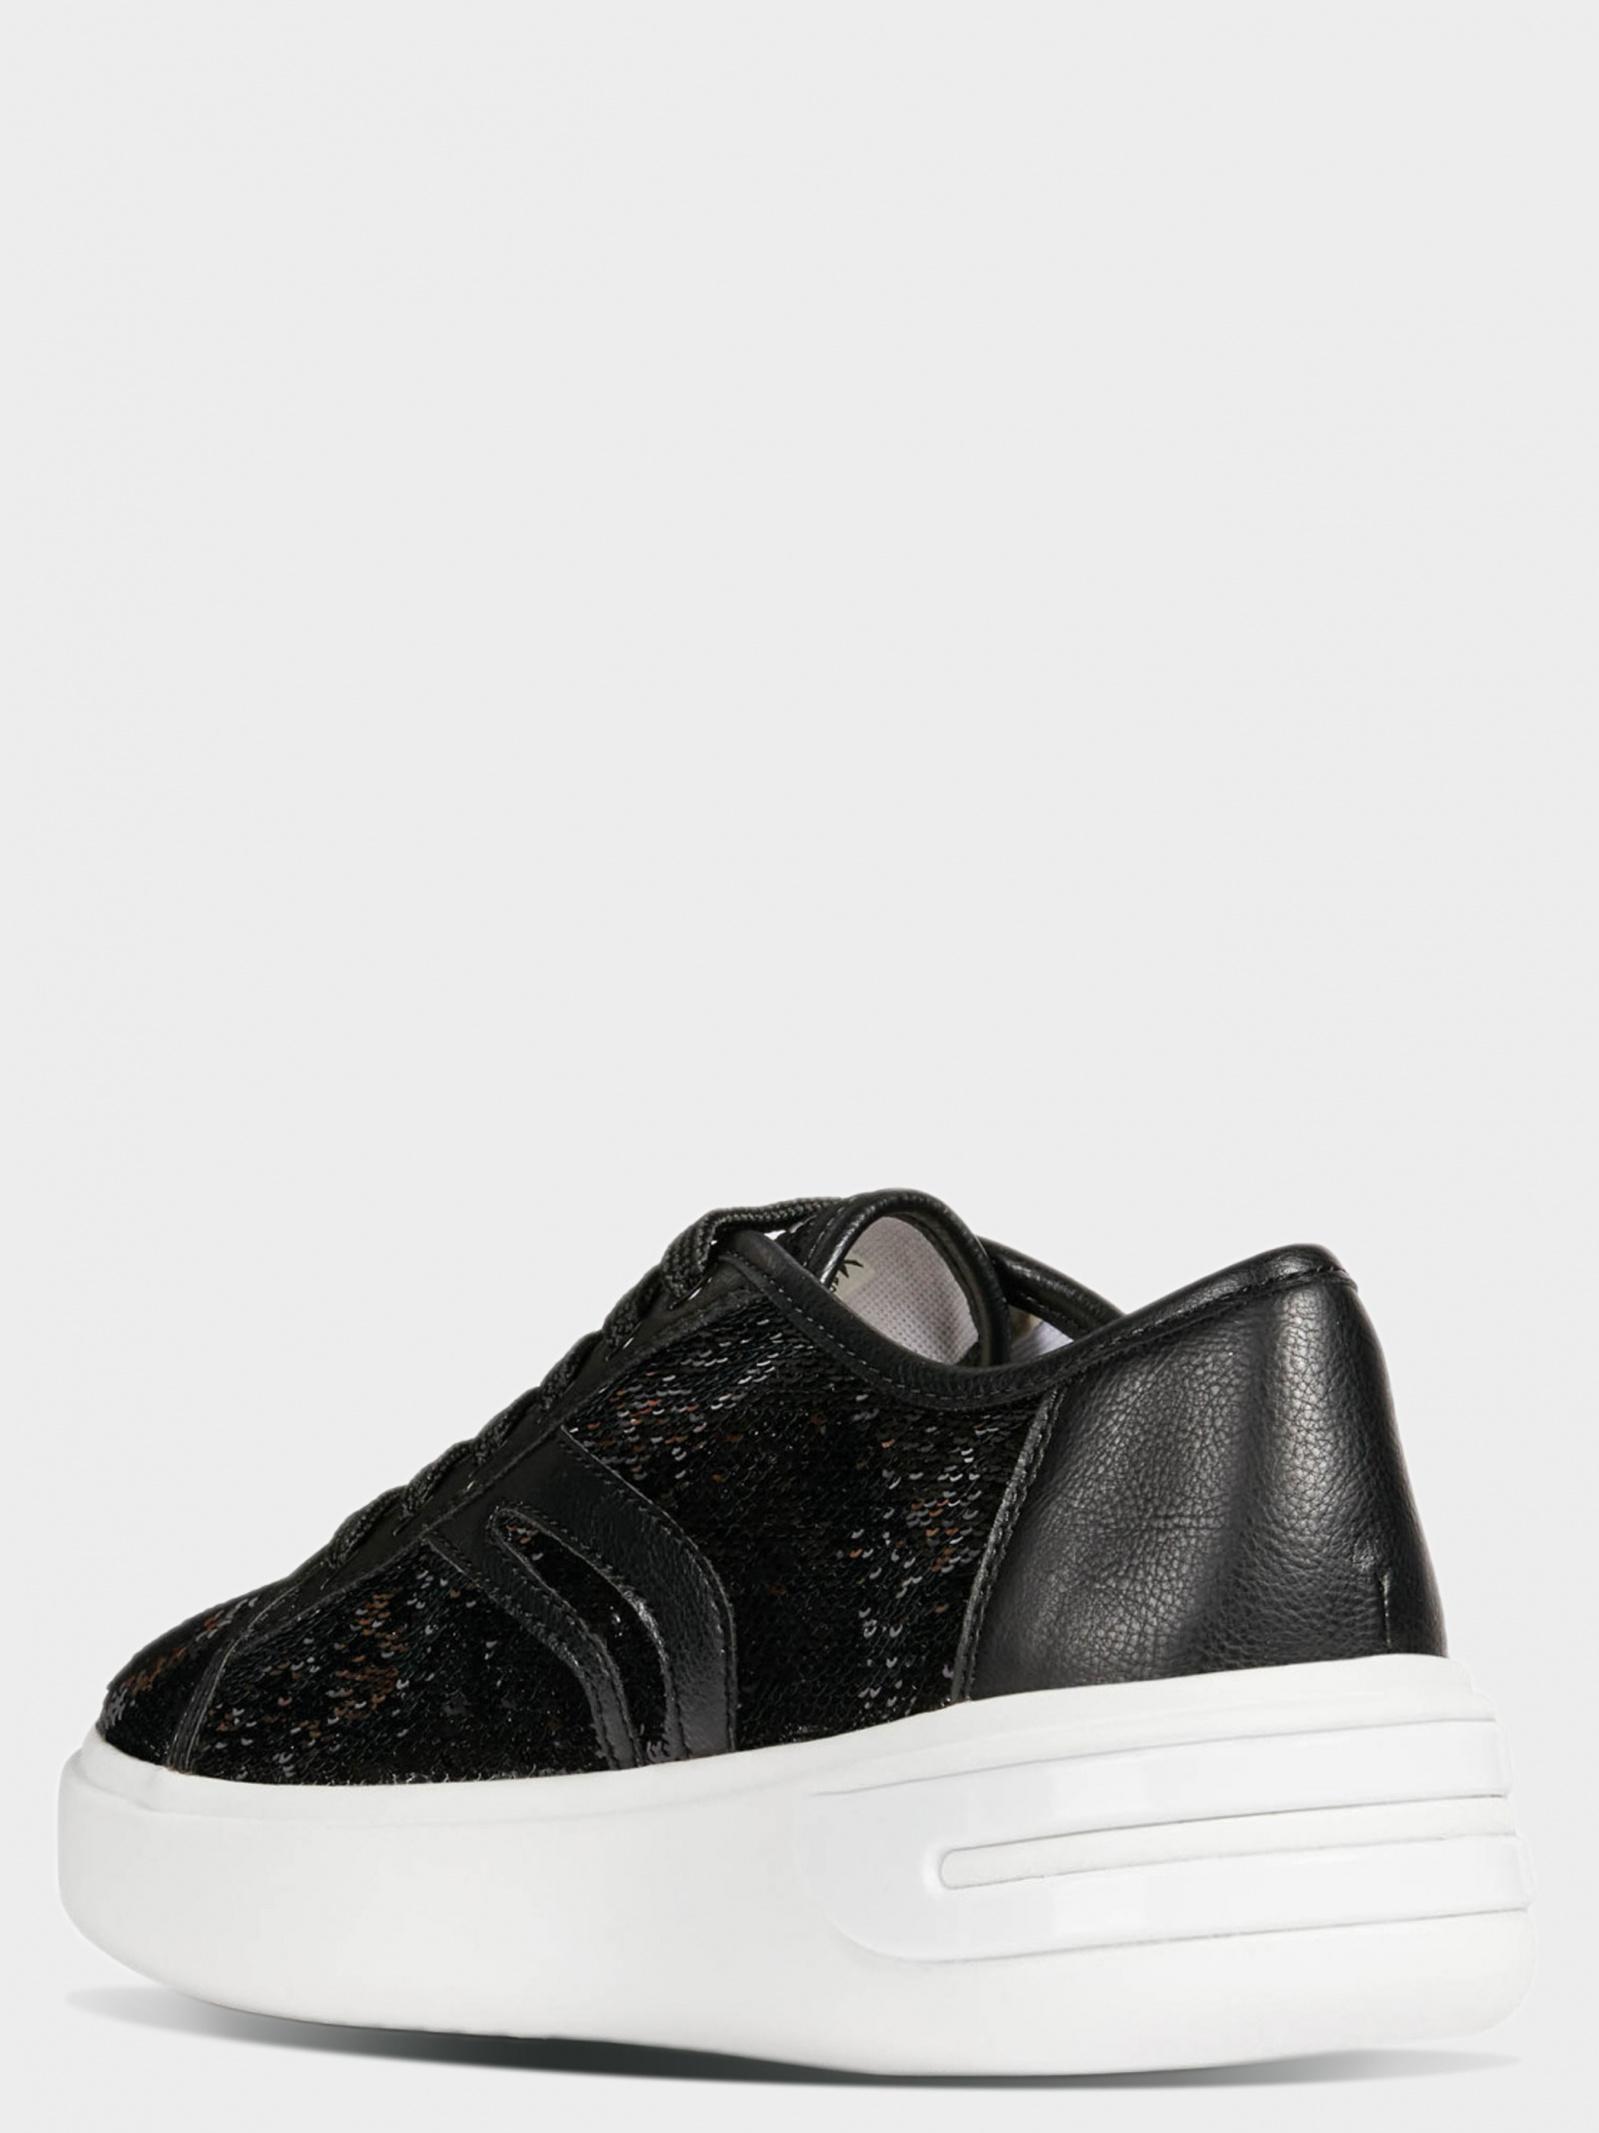 Полуботинки женские Geox D OTTAYA XW3557 размеры обуви, 2017